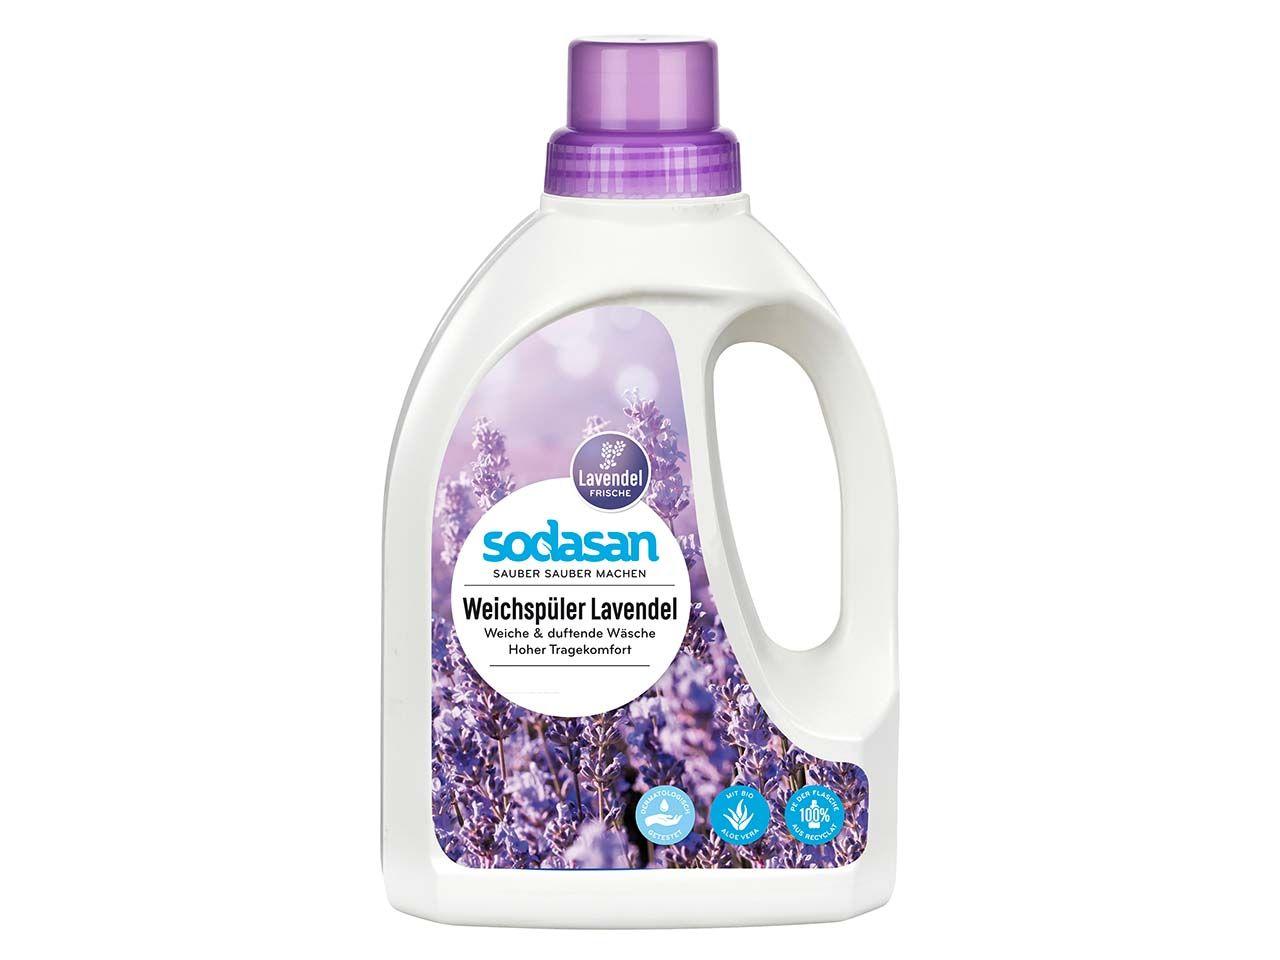 Sodasan Weichspüler Lavendel 0,75 l 1613